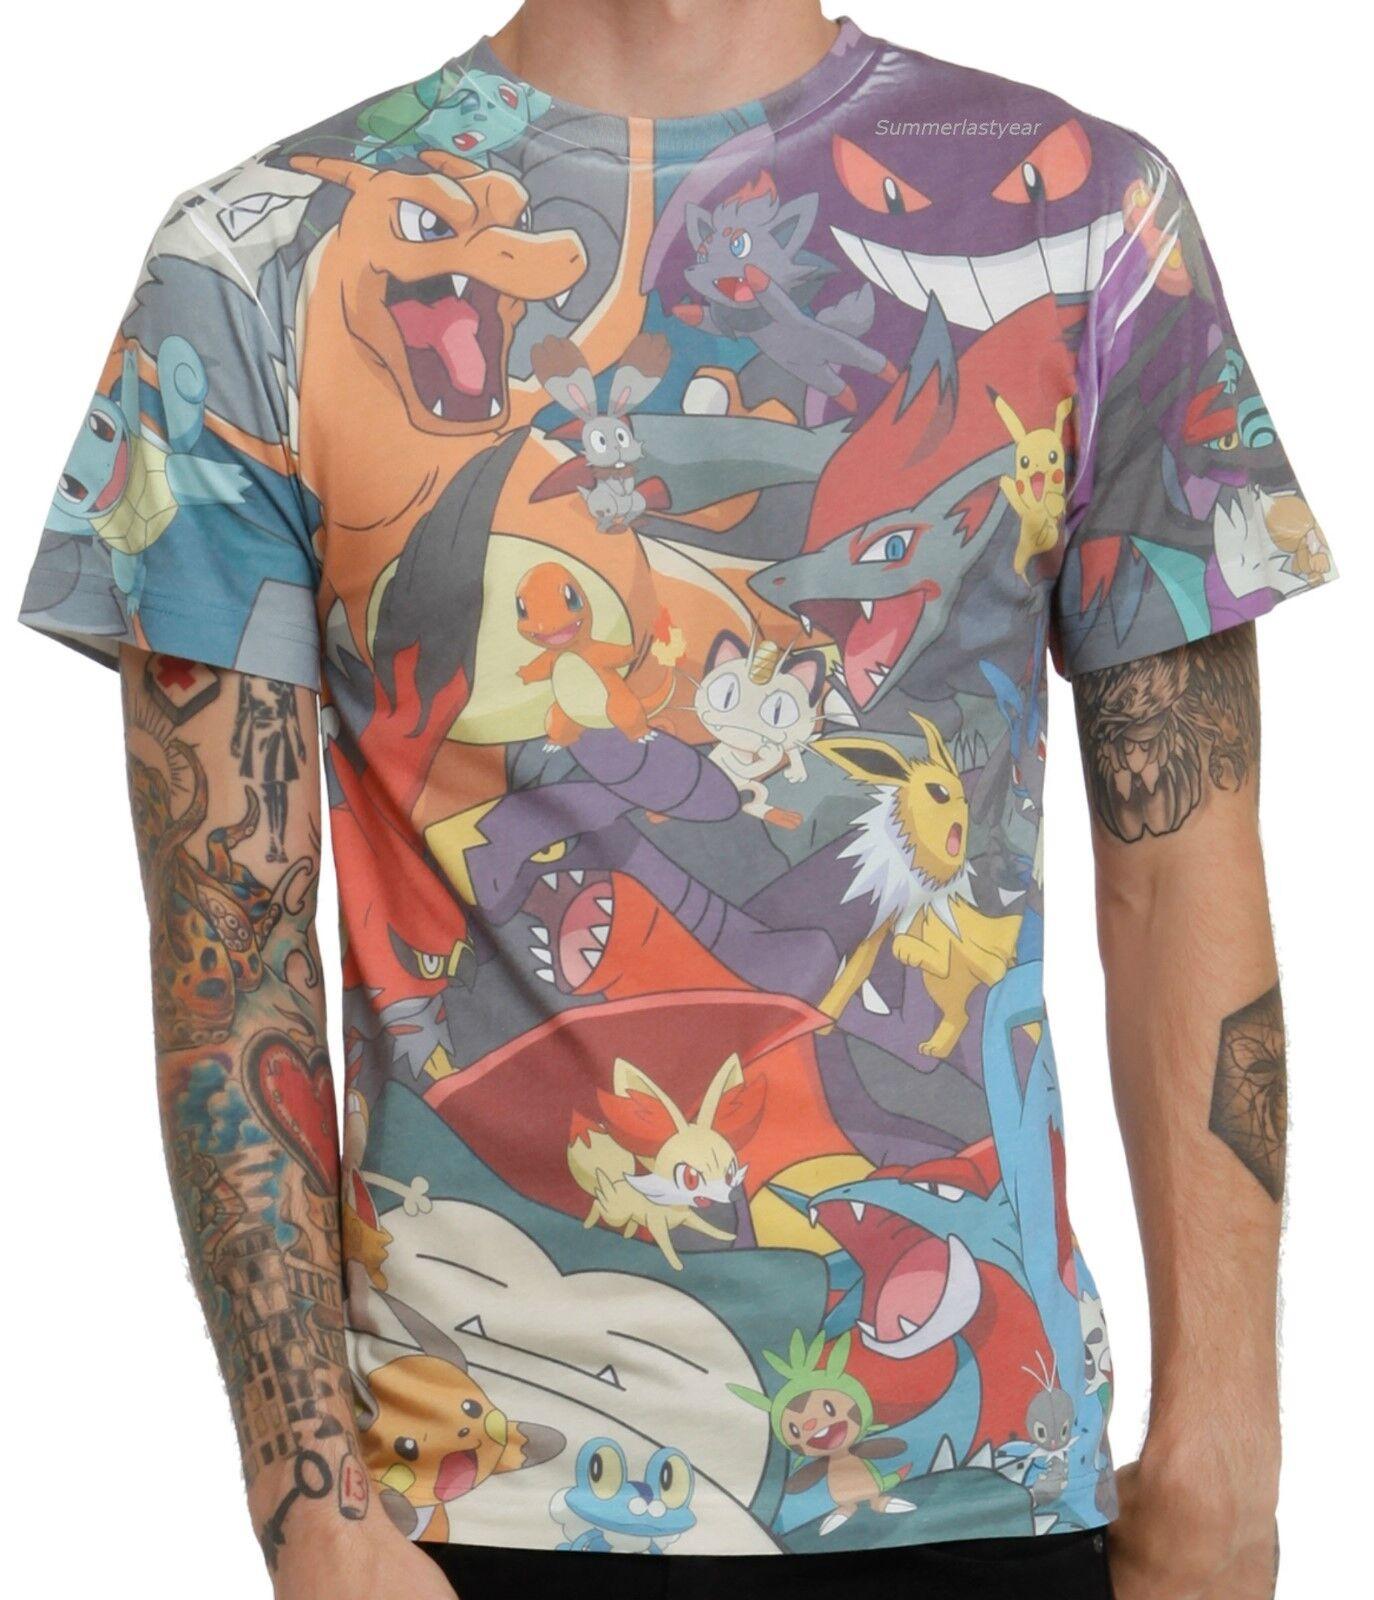 Pokemon Group Sublimation Print T Shirt Adult Unisexlicensed